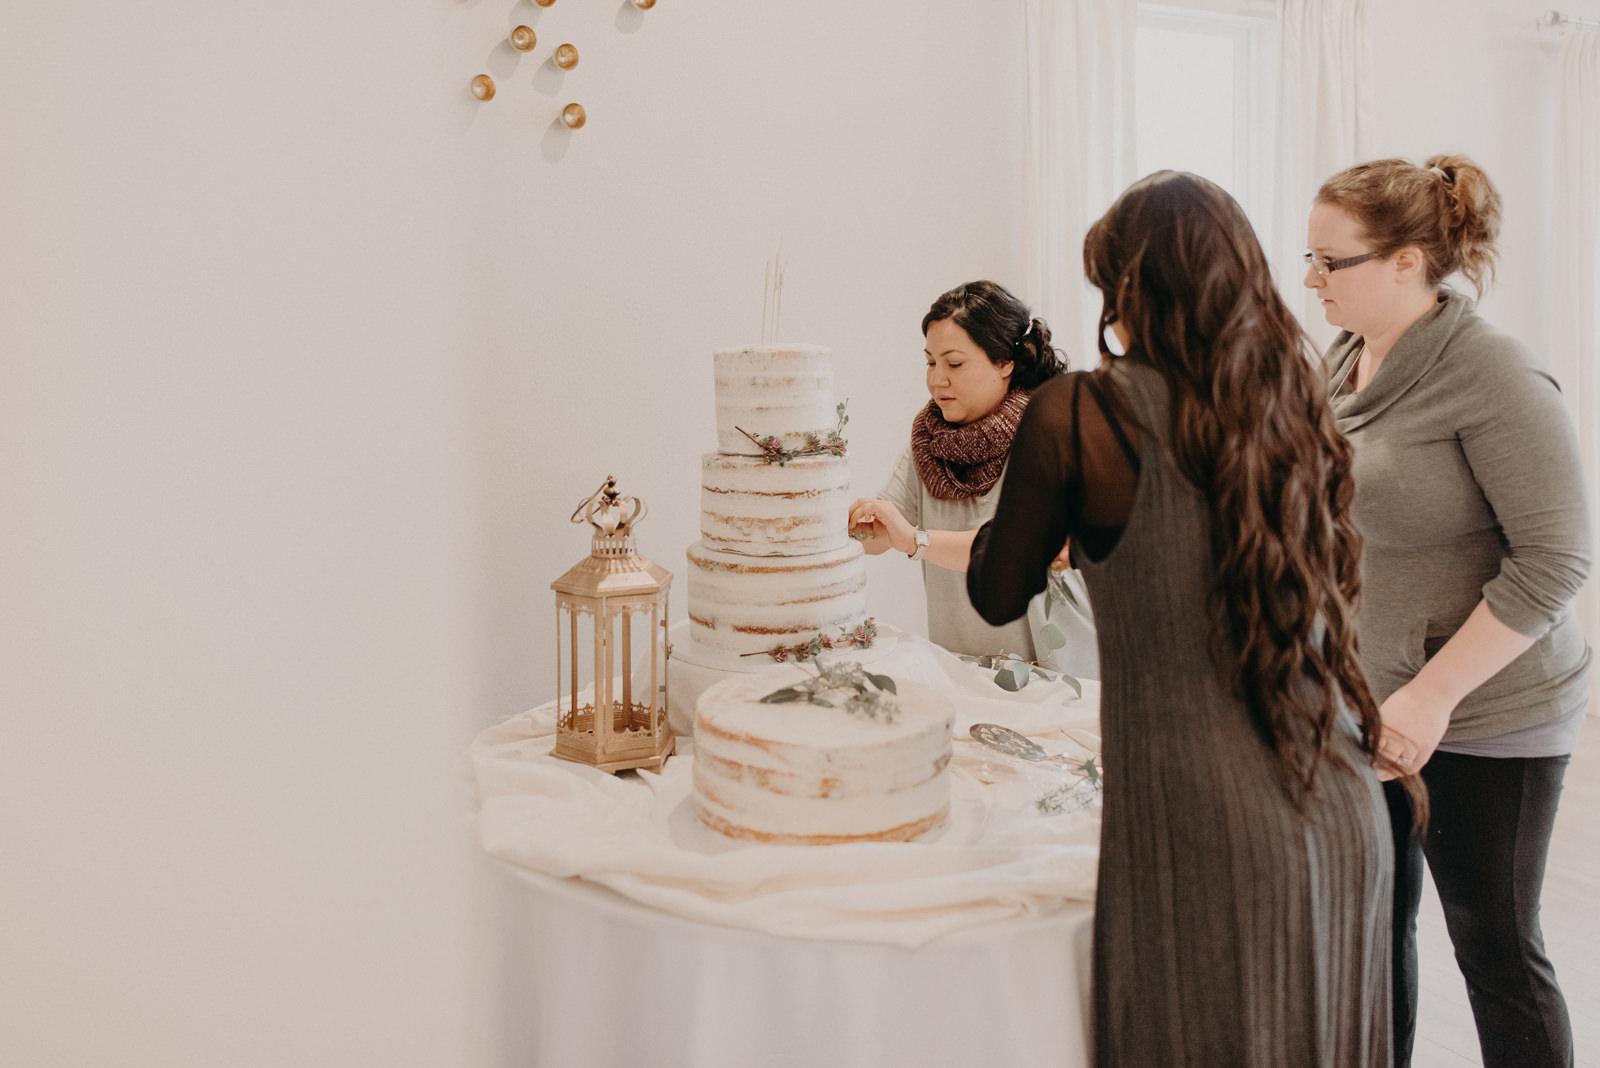 wedding cake being decorated